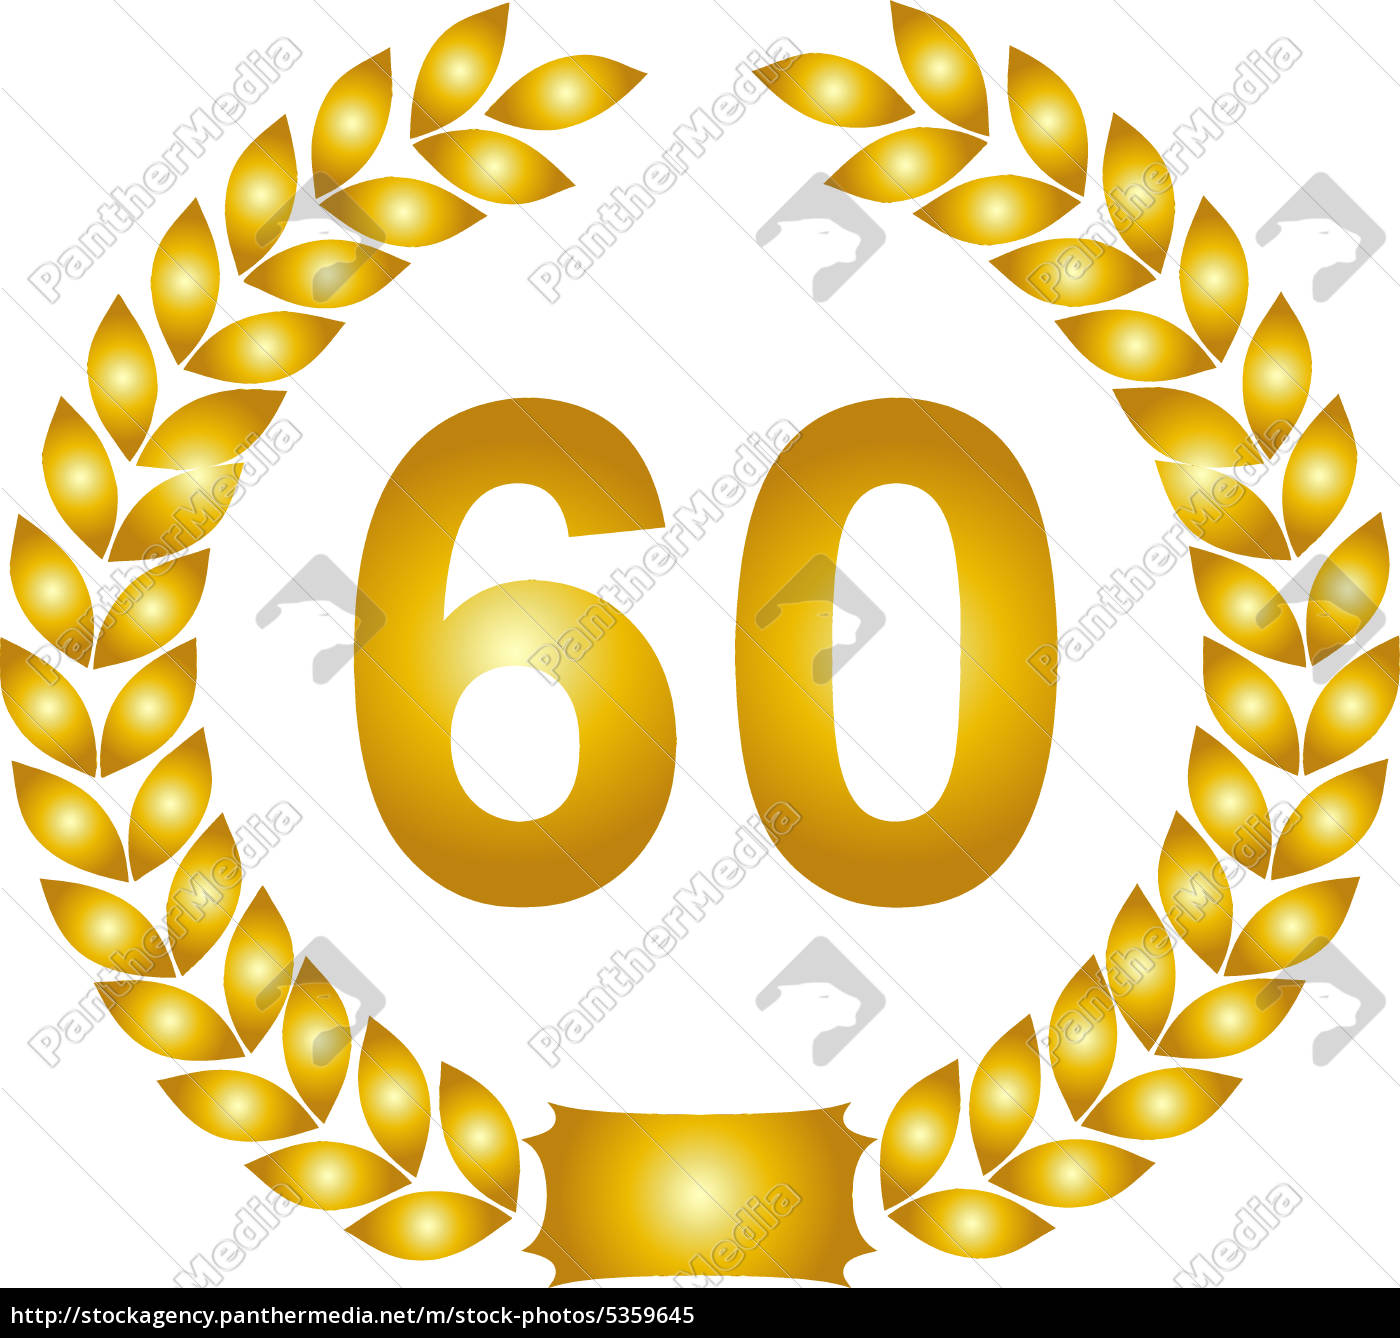 ønsker 40 års fødselsdag